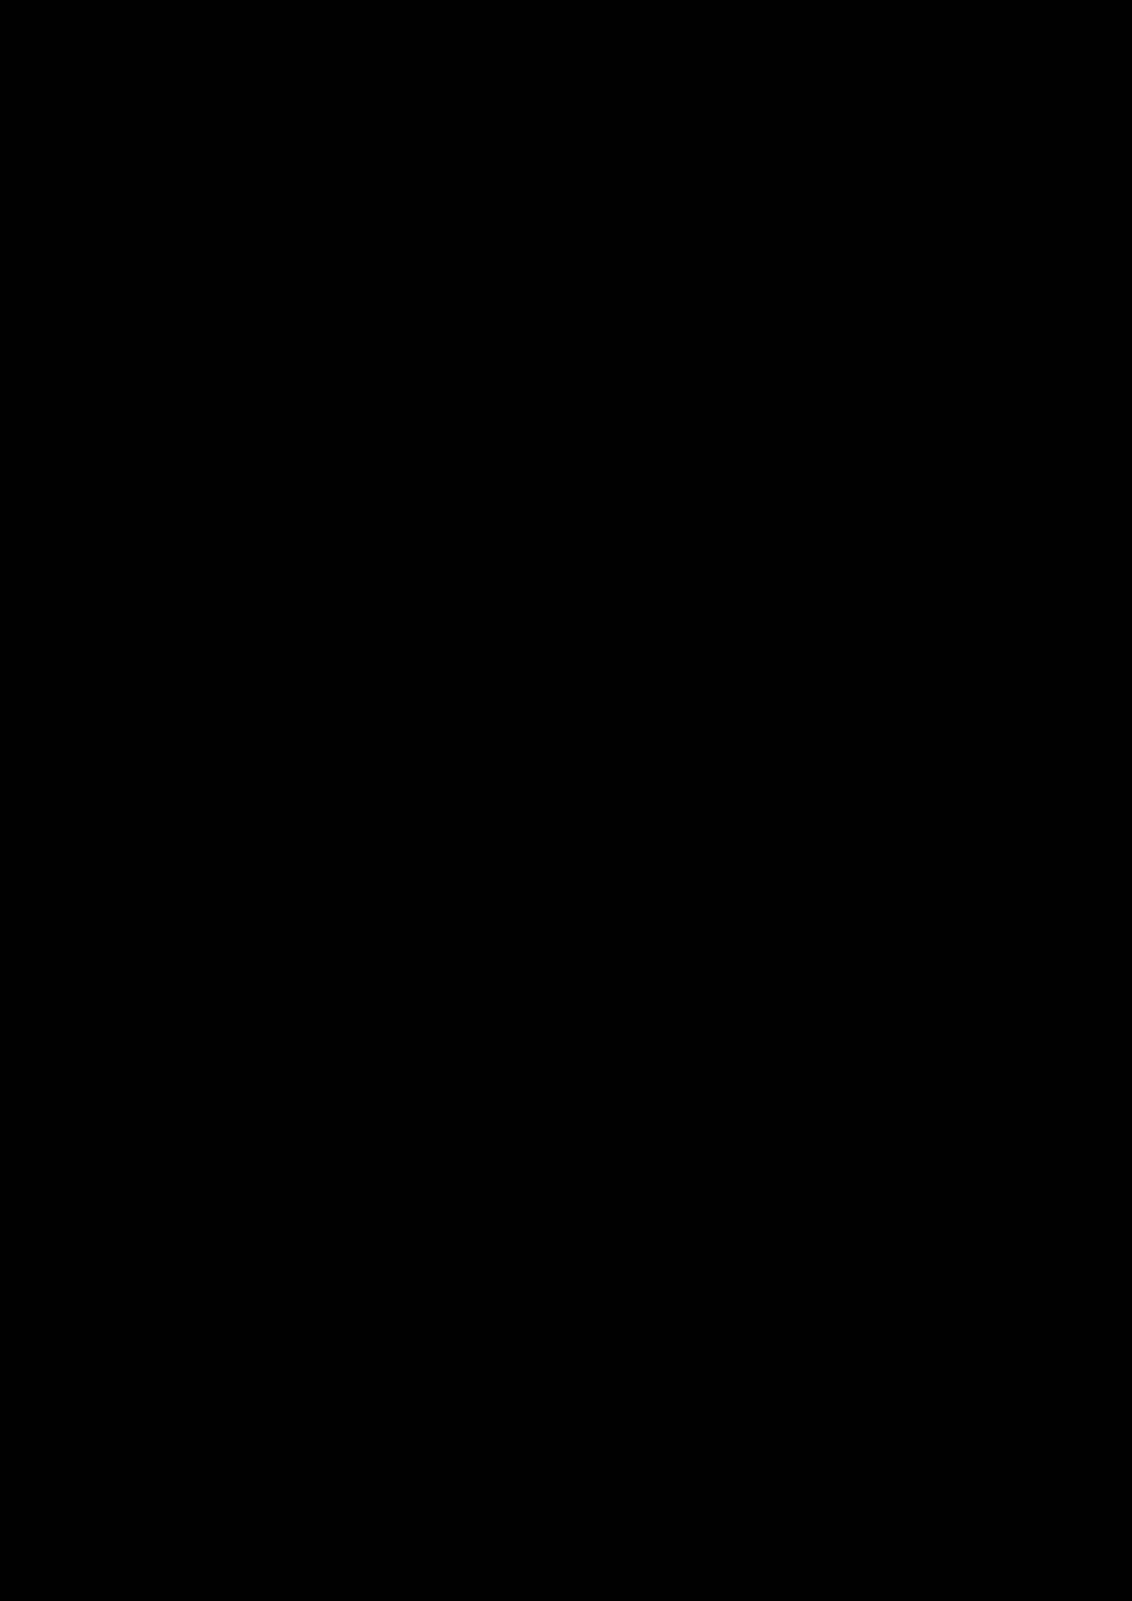 Ten lyubvi slide, Image 49